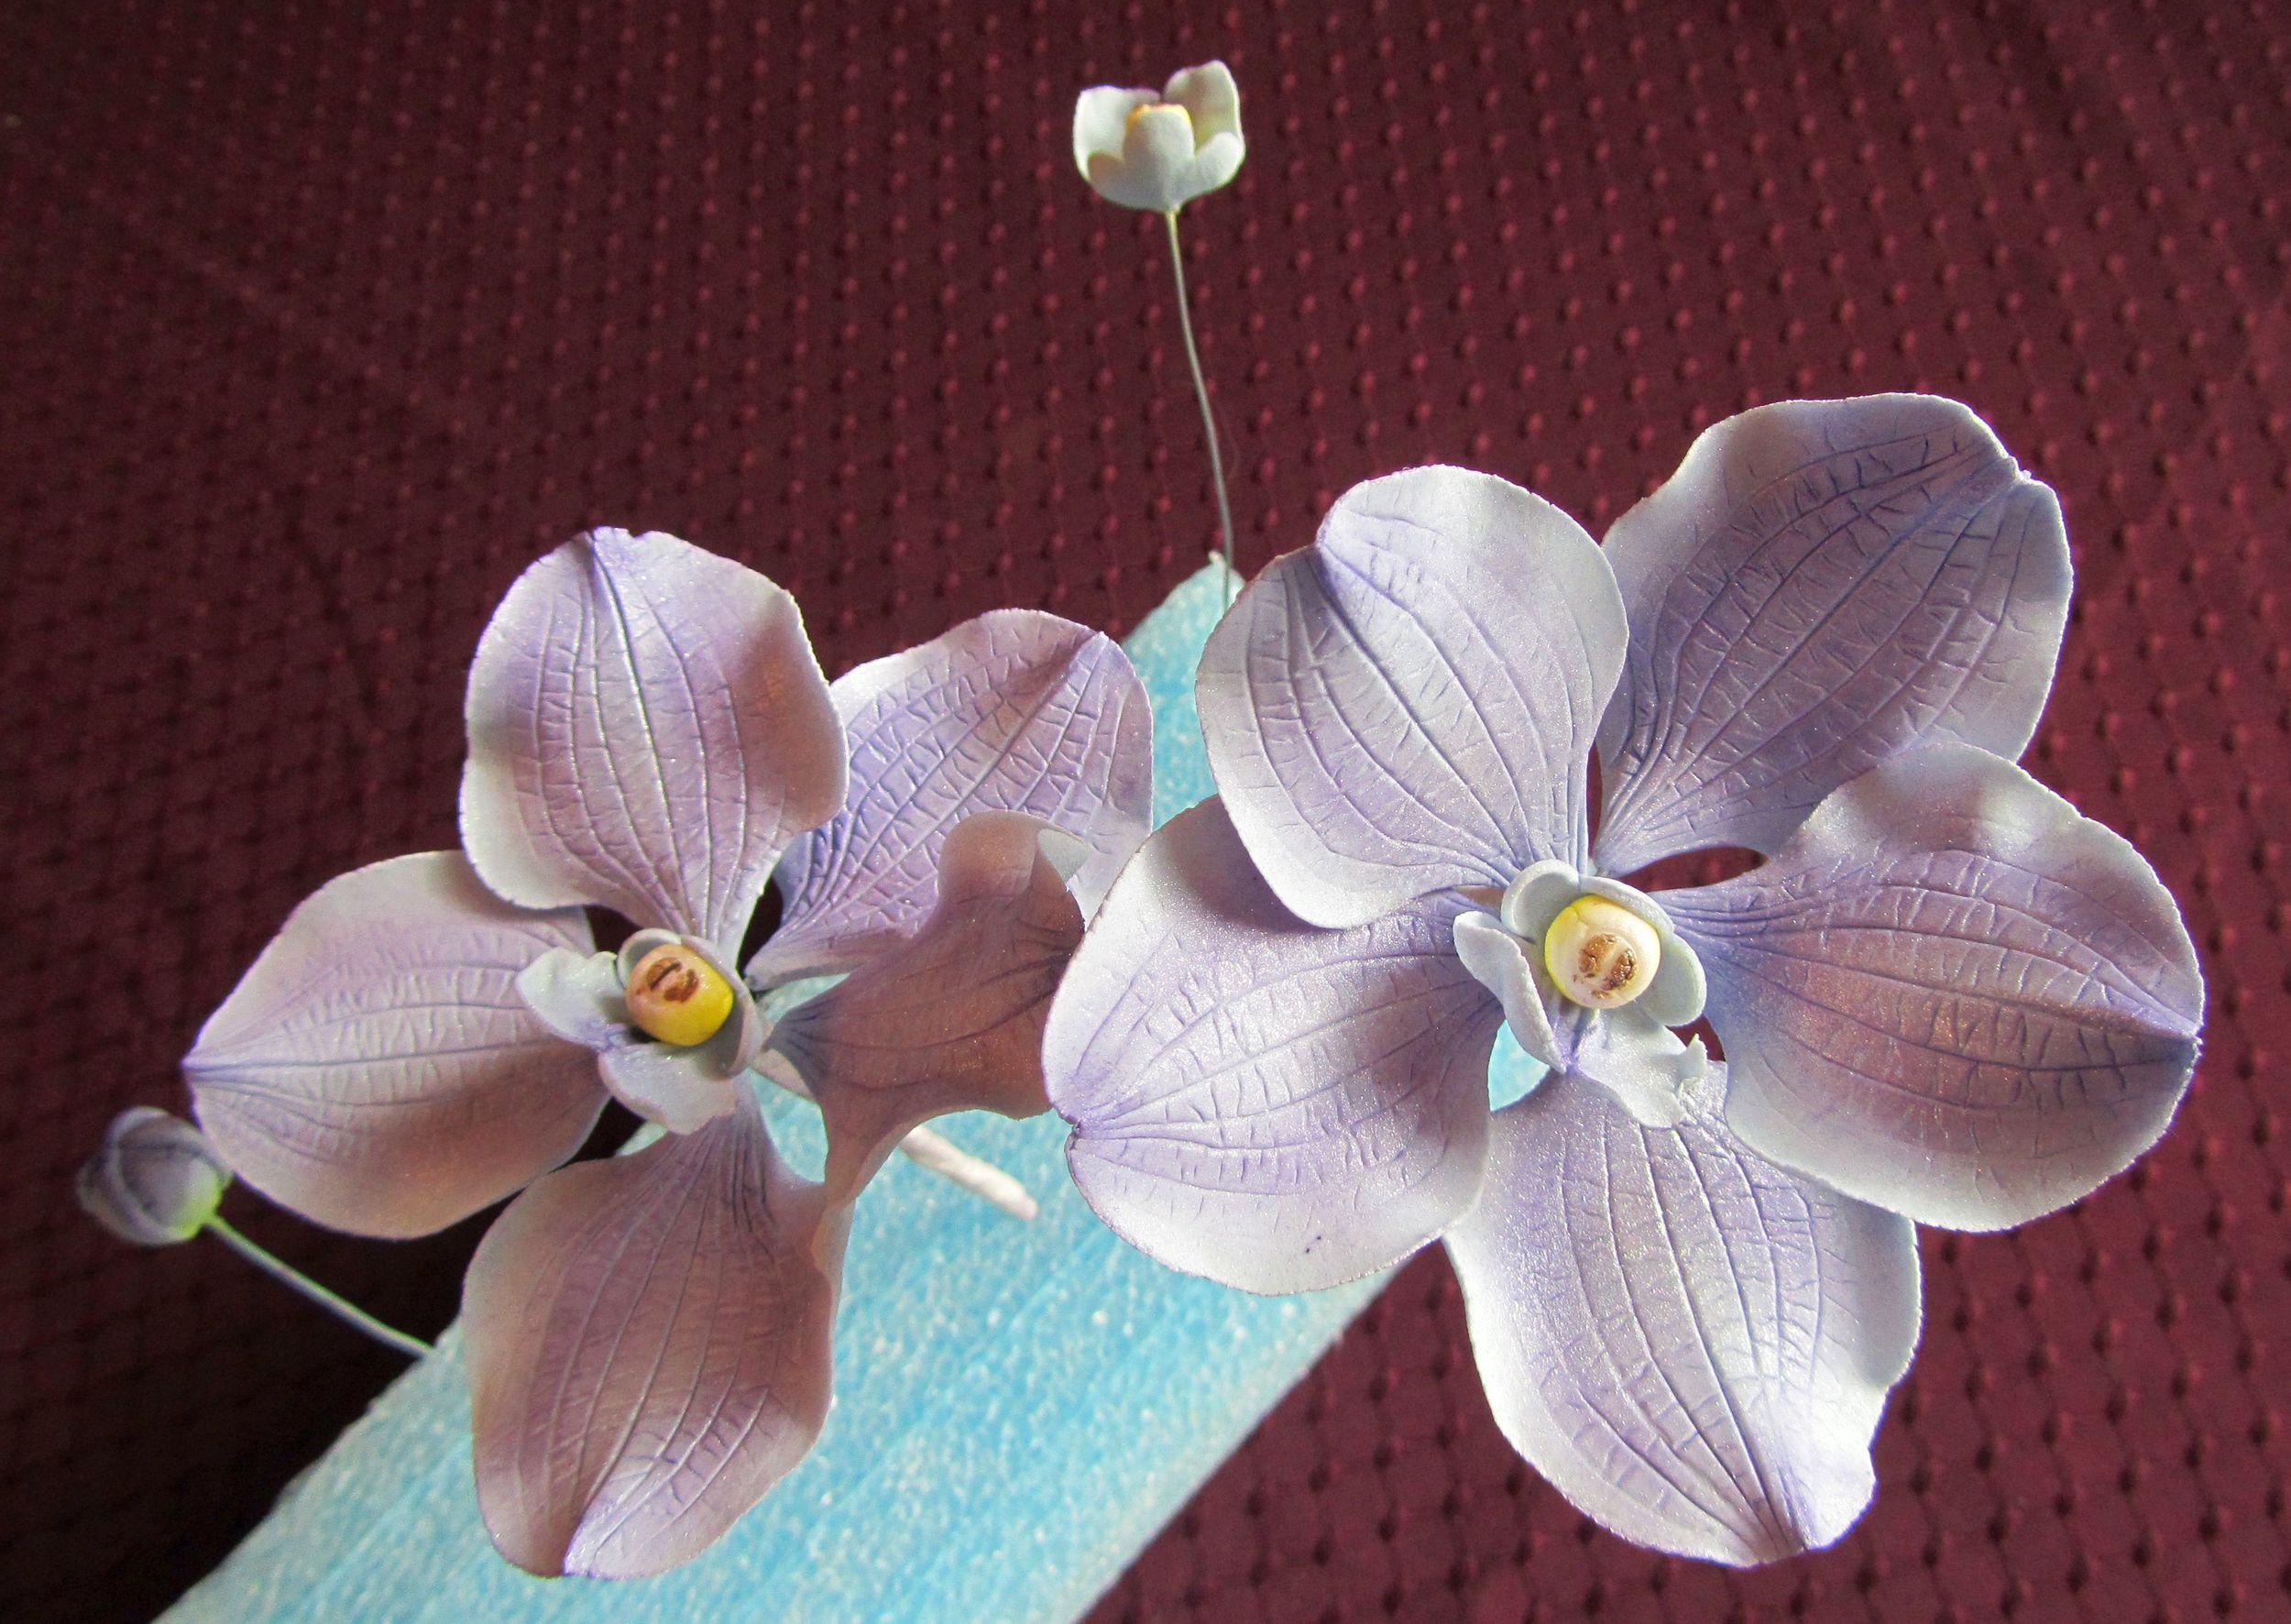 Sugar Vanda Orchids in pale lavender. Image © Carla Schier.